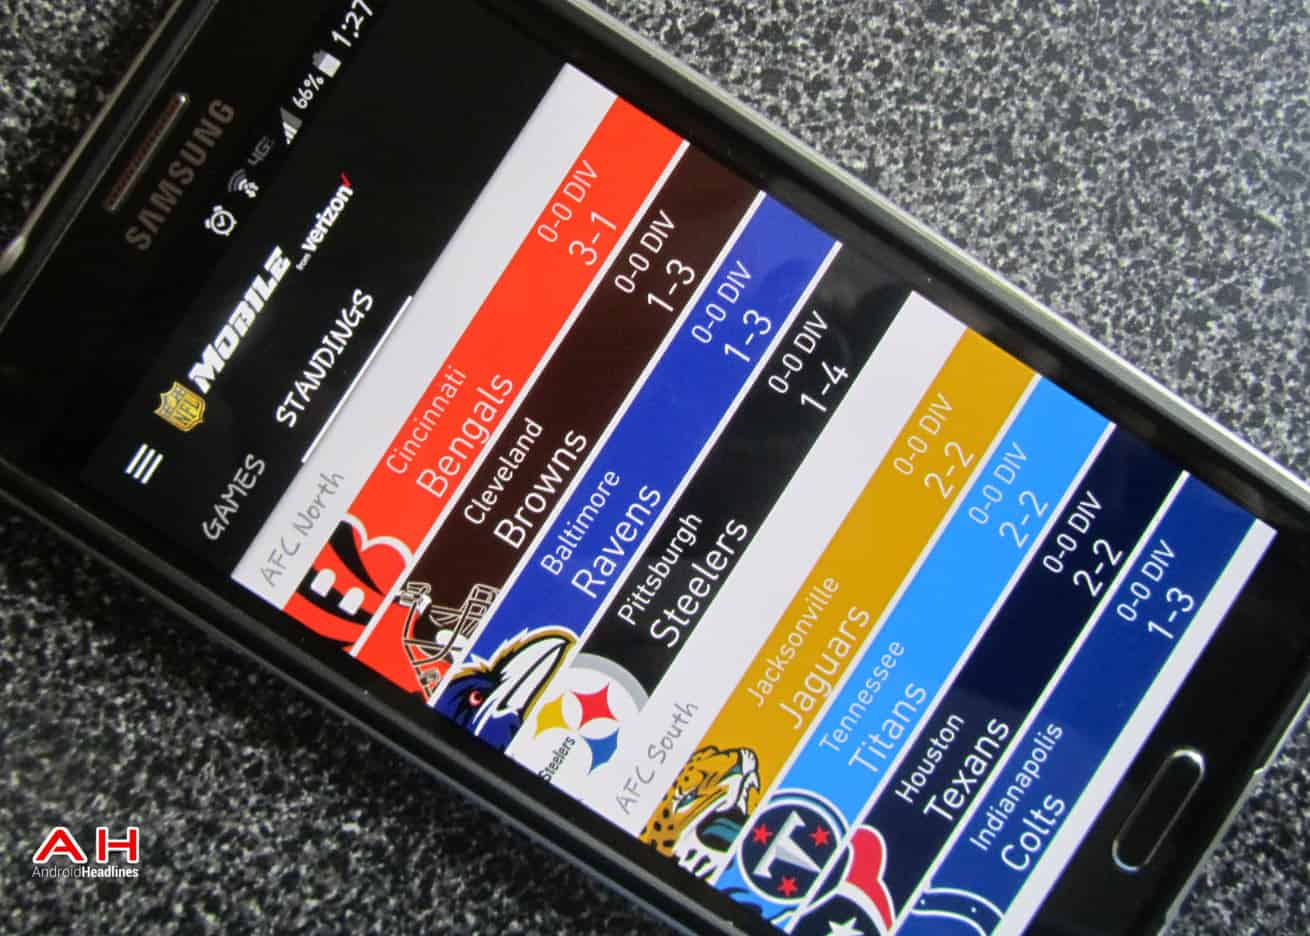 NFL Official App 2 cam AH